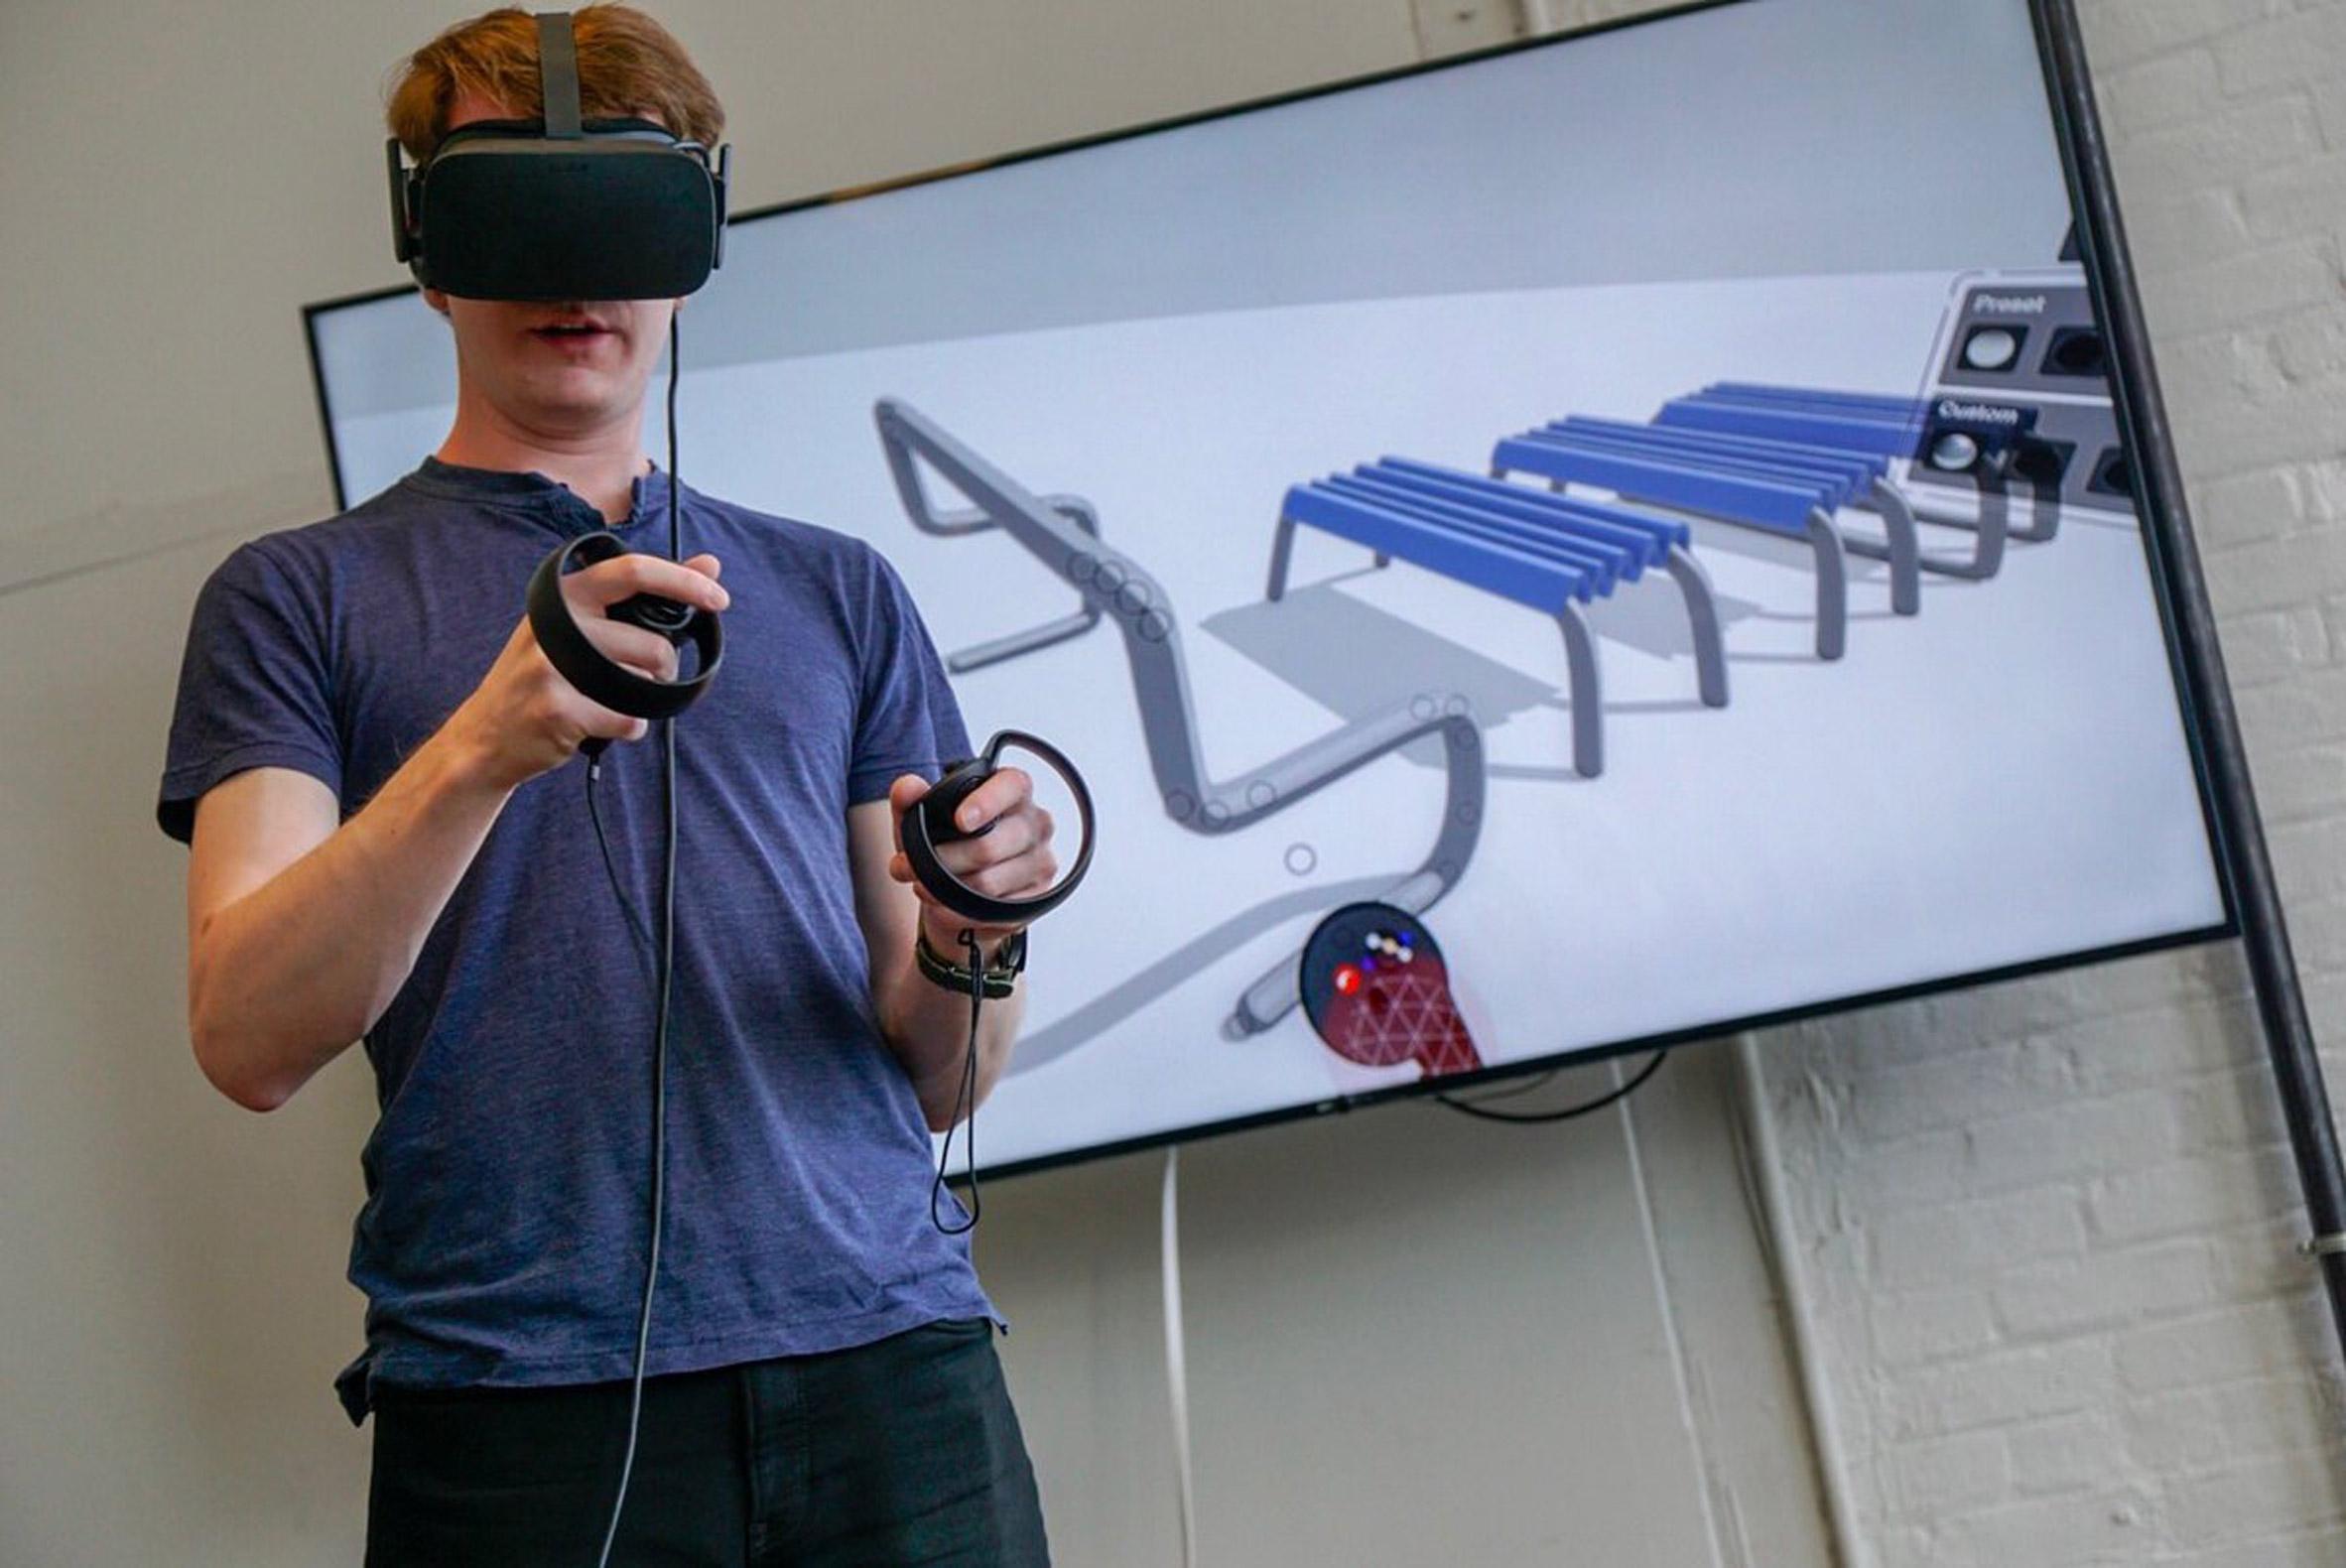 gravity-sketch-design-virtual-reality-visual atelier 8-2.jpg